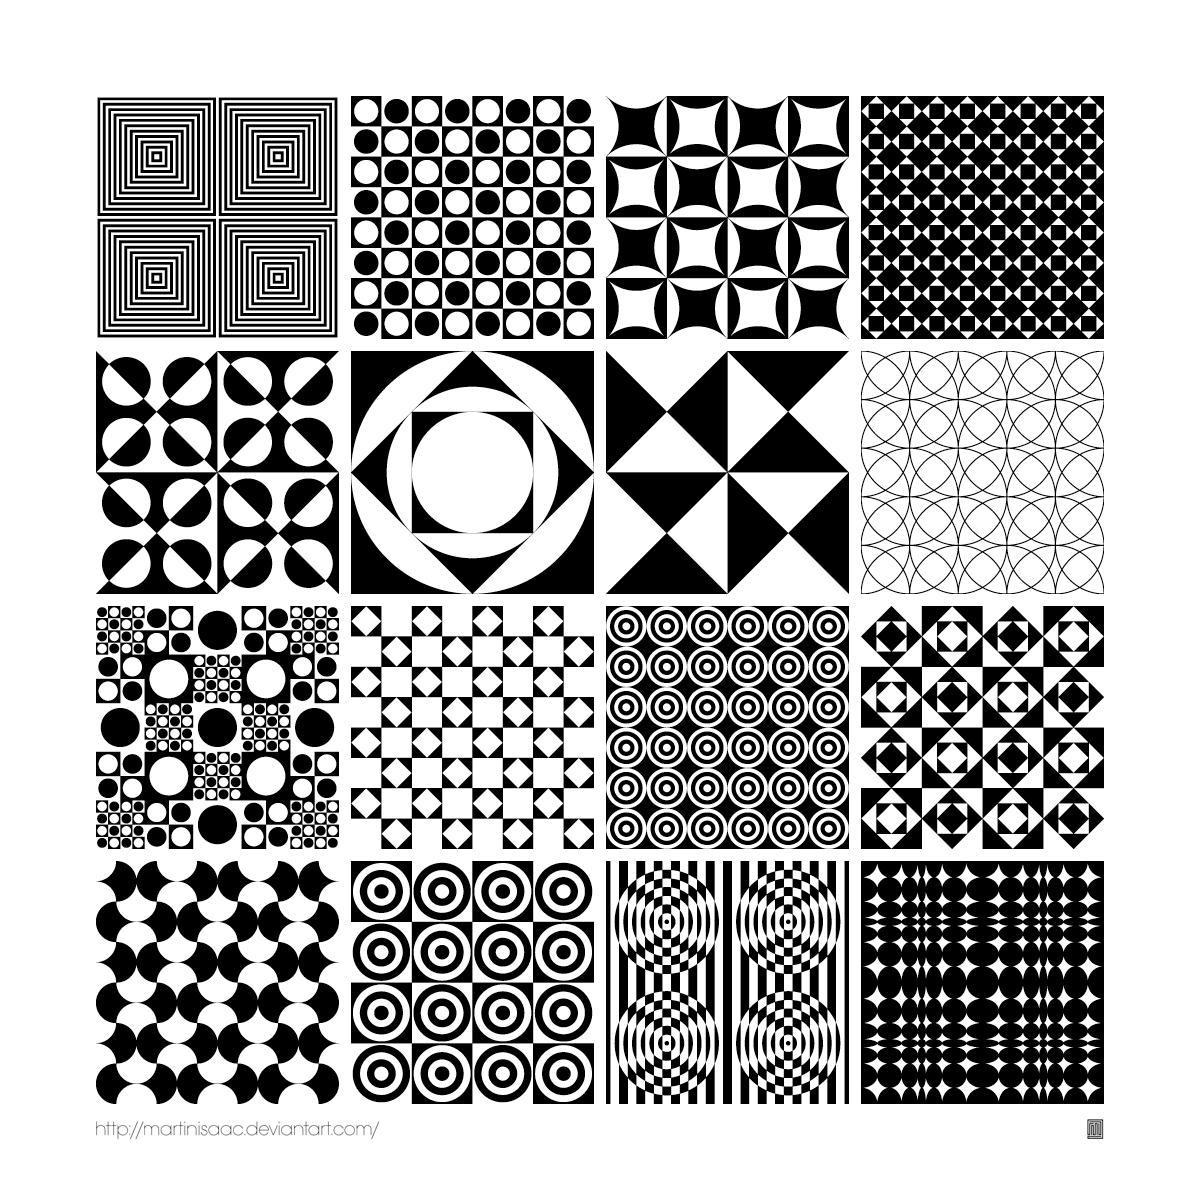 Monochrome Panton Patterns by MartinIsaac